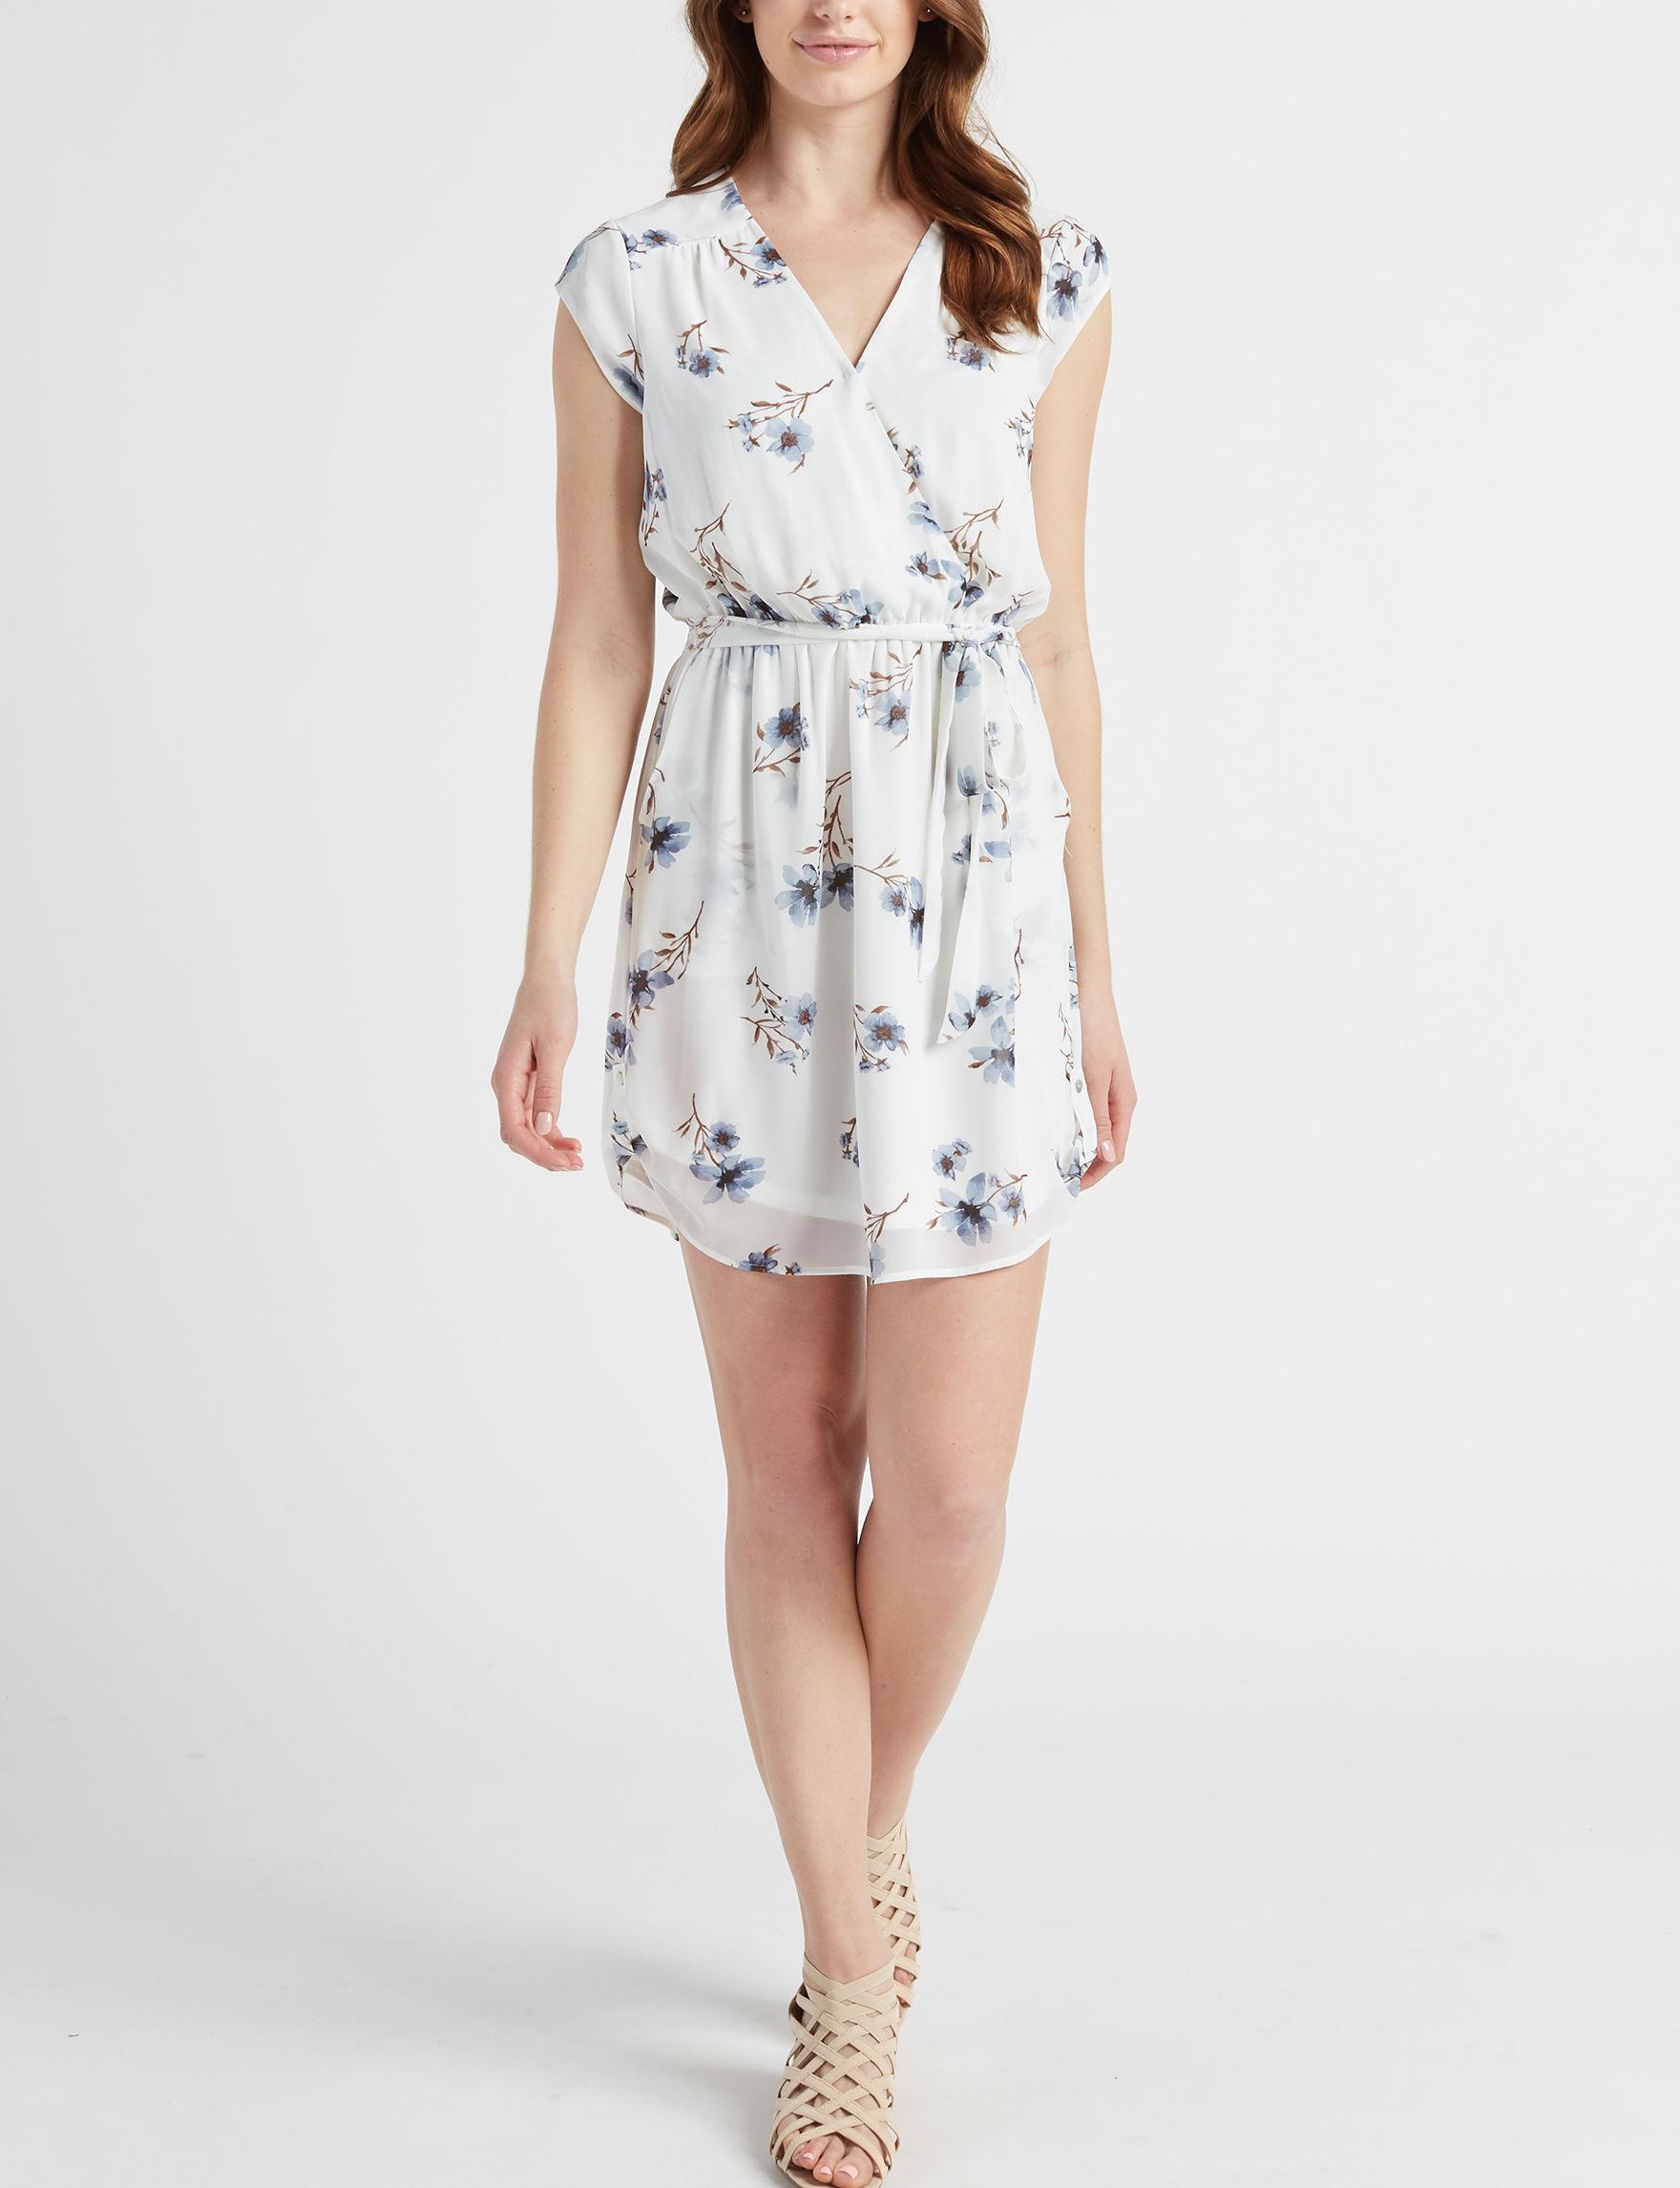 Signature Studio White Everyday & Casual A-line Dresses